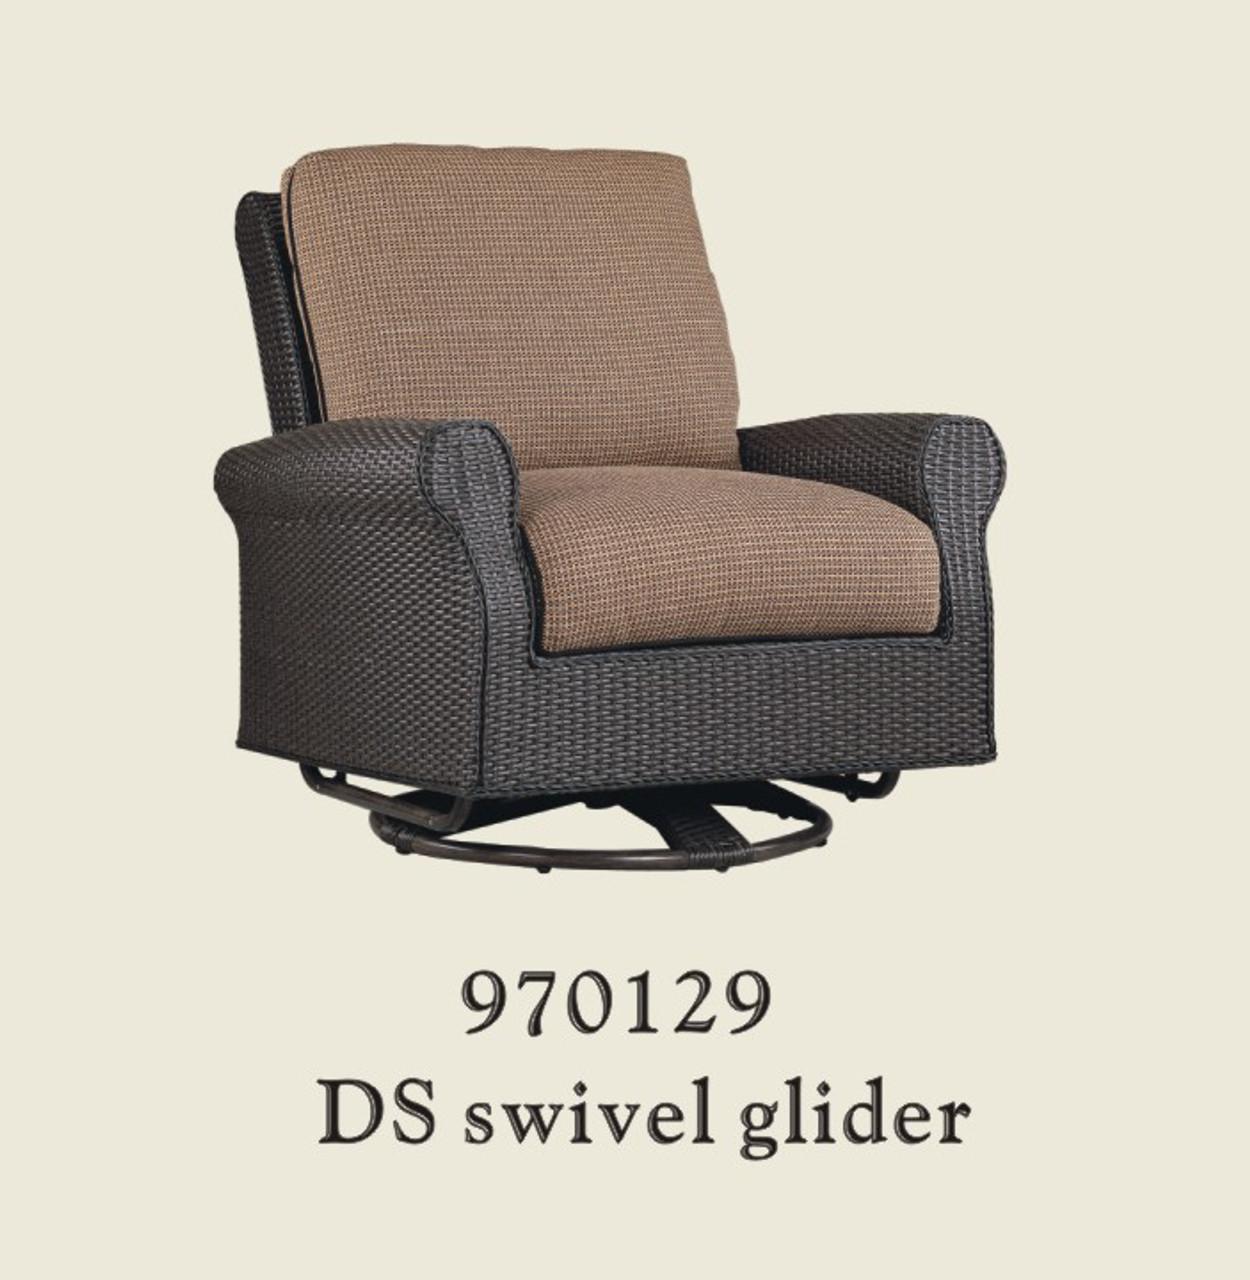 Phenomenal Patio Renaissance Monterey Collection Deep Seating Swivel Unemploymentrelief Wooden Chair Designs For Living Room Unemploymentrelieforg